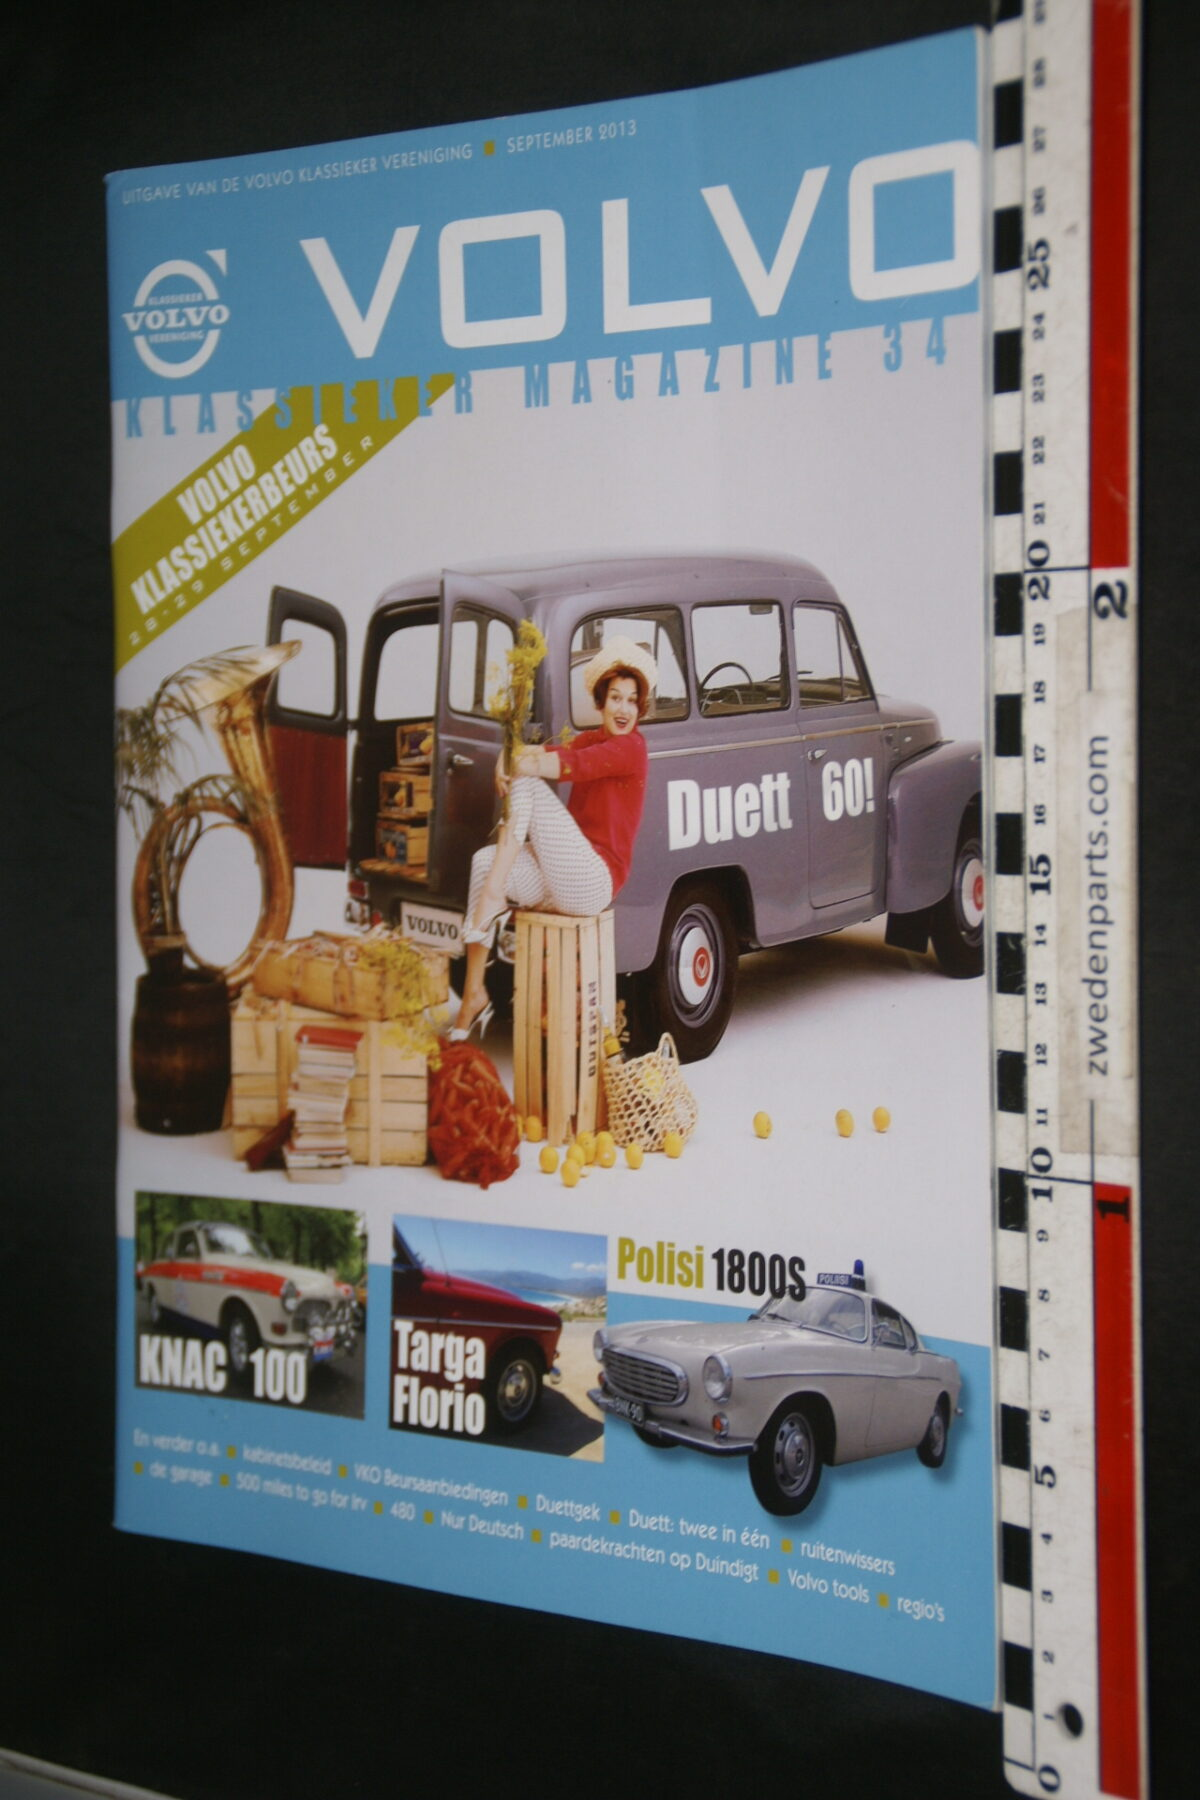 DSC09184 2013 september tijdschrift VKM Volvoclub